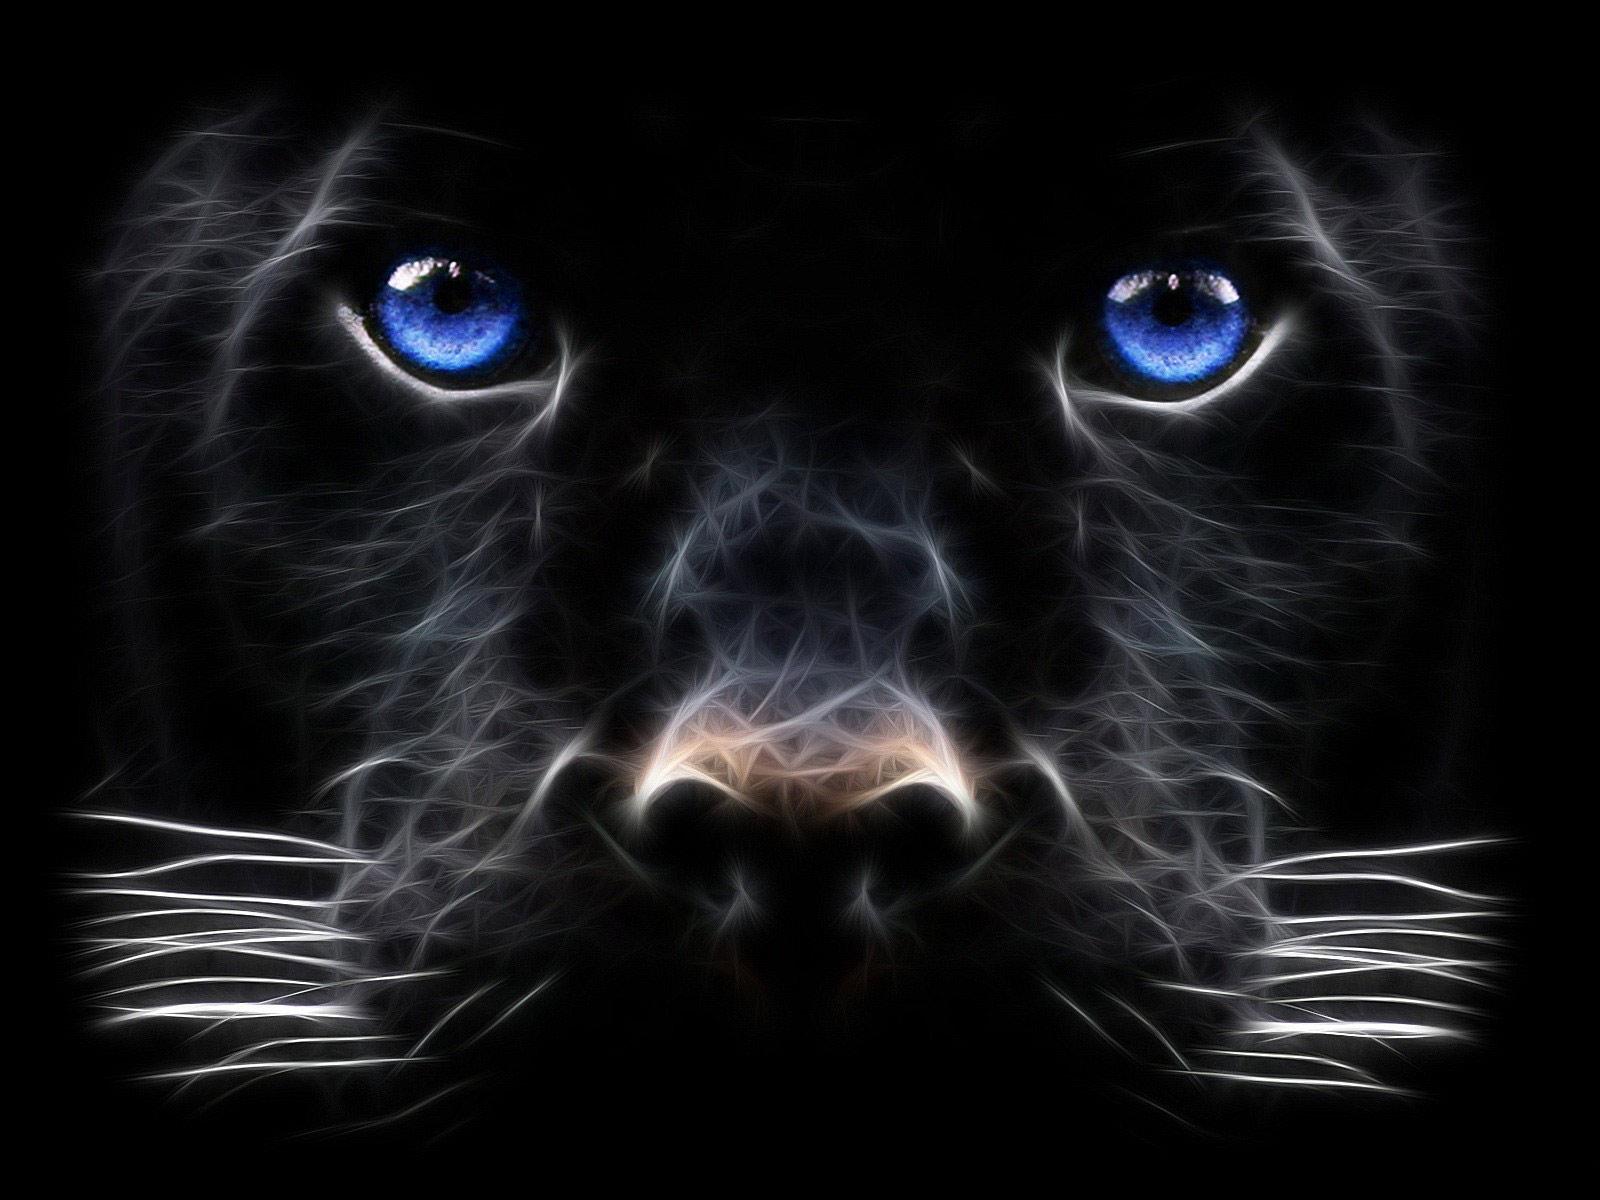 Black Panther Big Cat Digital Art HD Wallpaper Hd Wallpaper 1600x1200